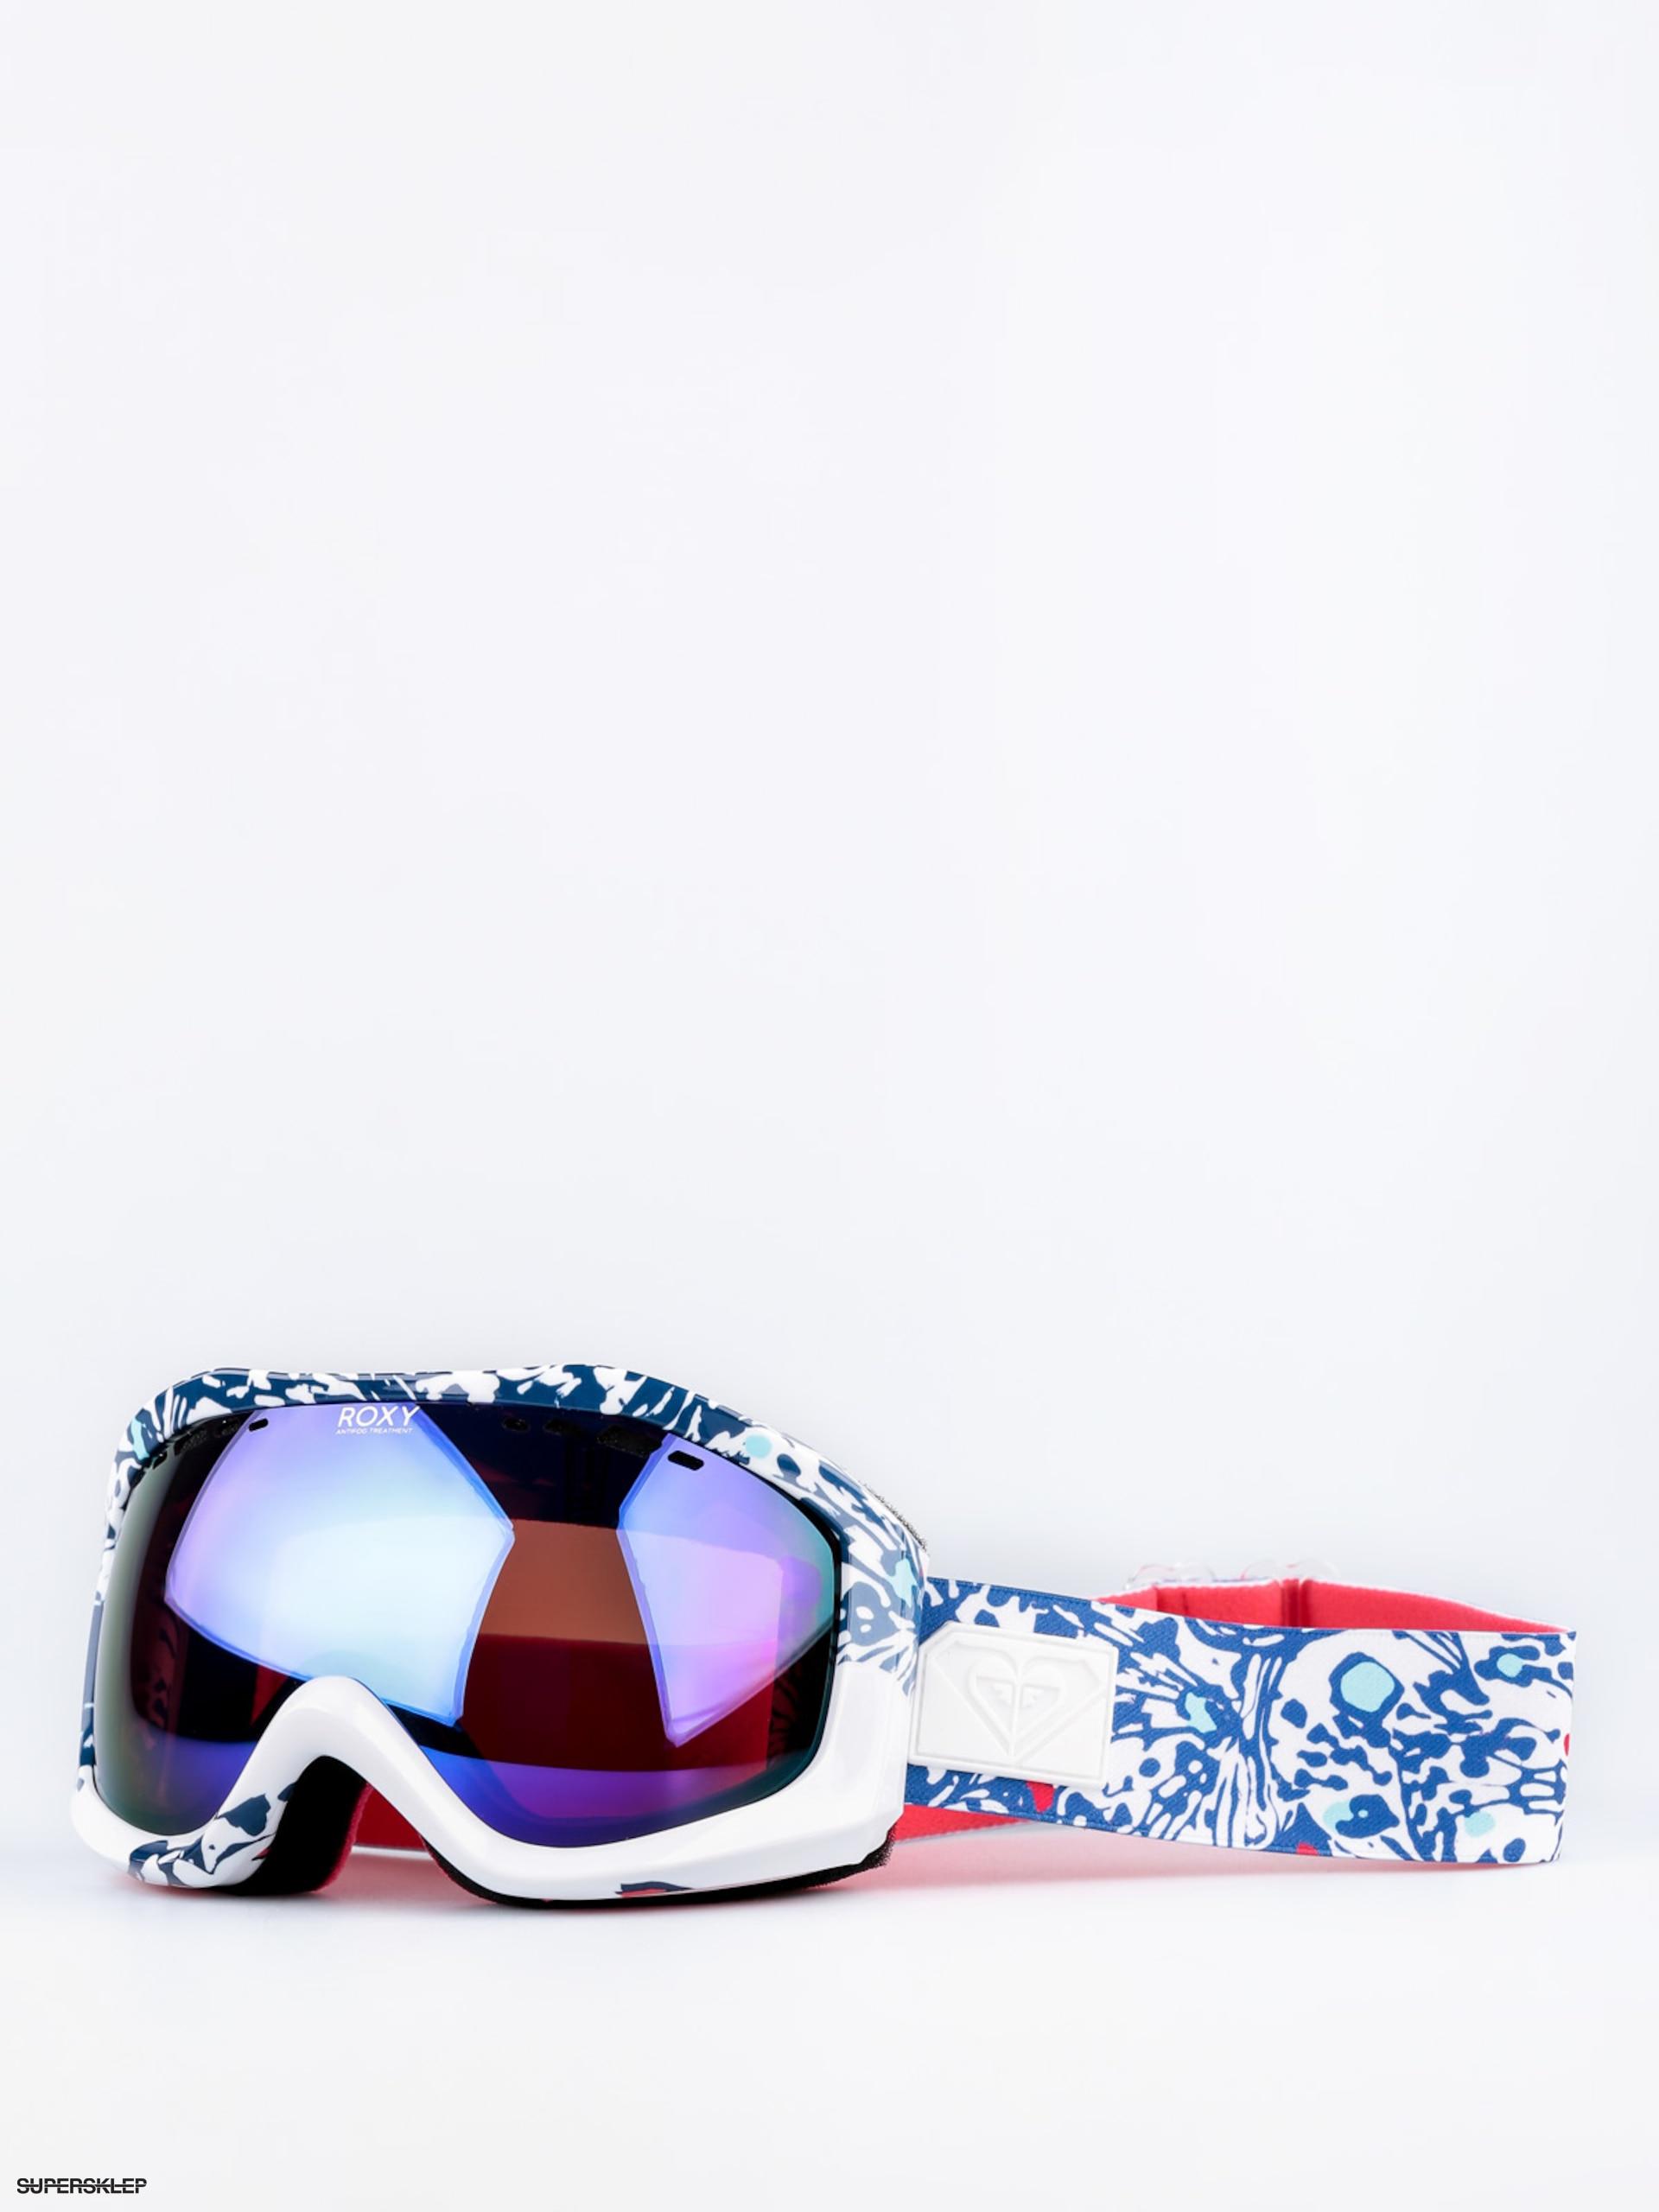 c9fca3ad0 Okuliare na snowboard Roxy Sunset Art Series Wmn (butterfly blue  print/amber rose ml blue)